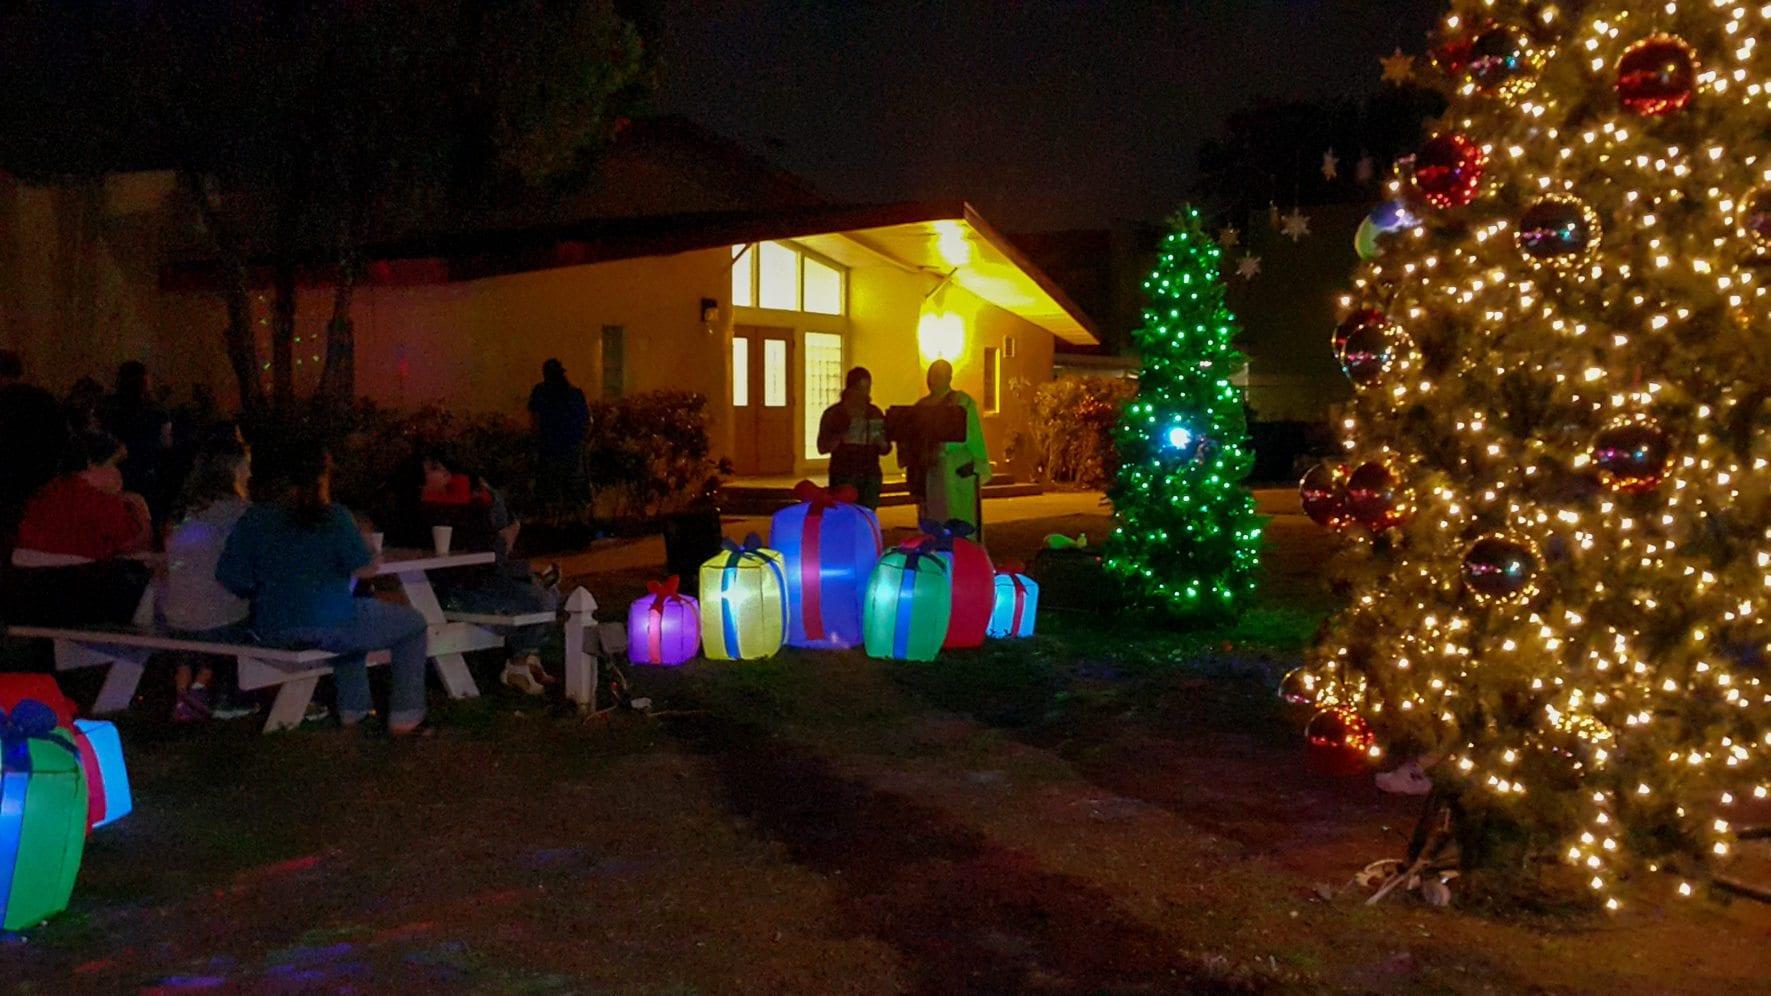 christmas tree lighting photos 2016 sacred heart catholic church of pinellas park. Black Bedroom Furniture Sets. Home Design Ideas